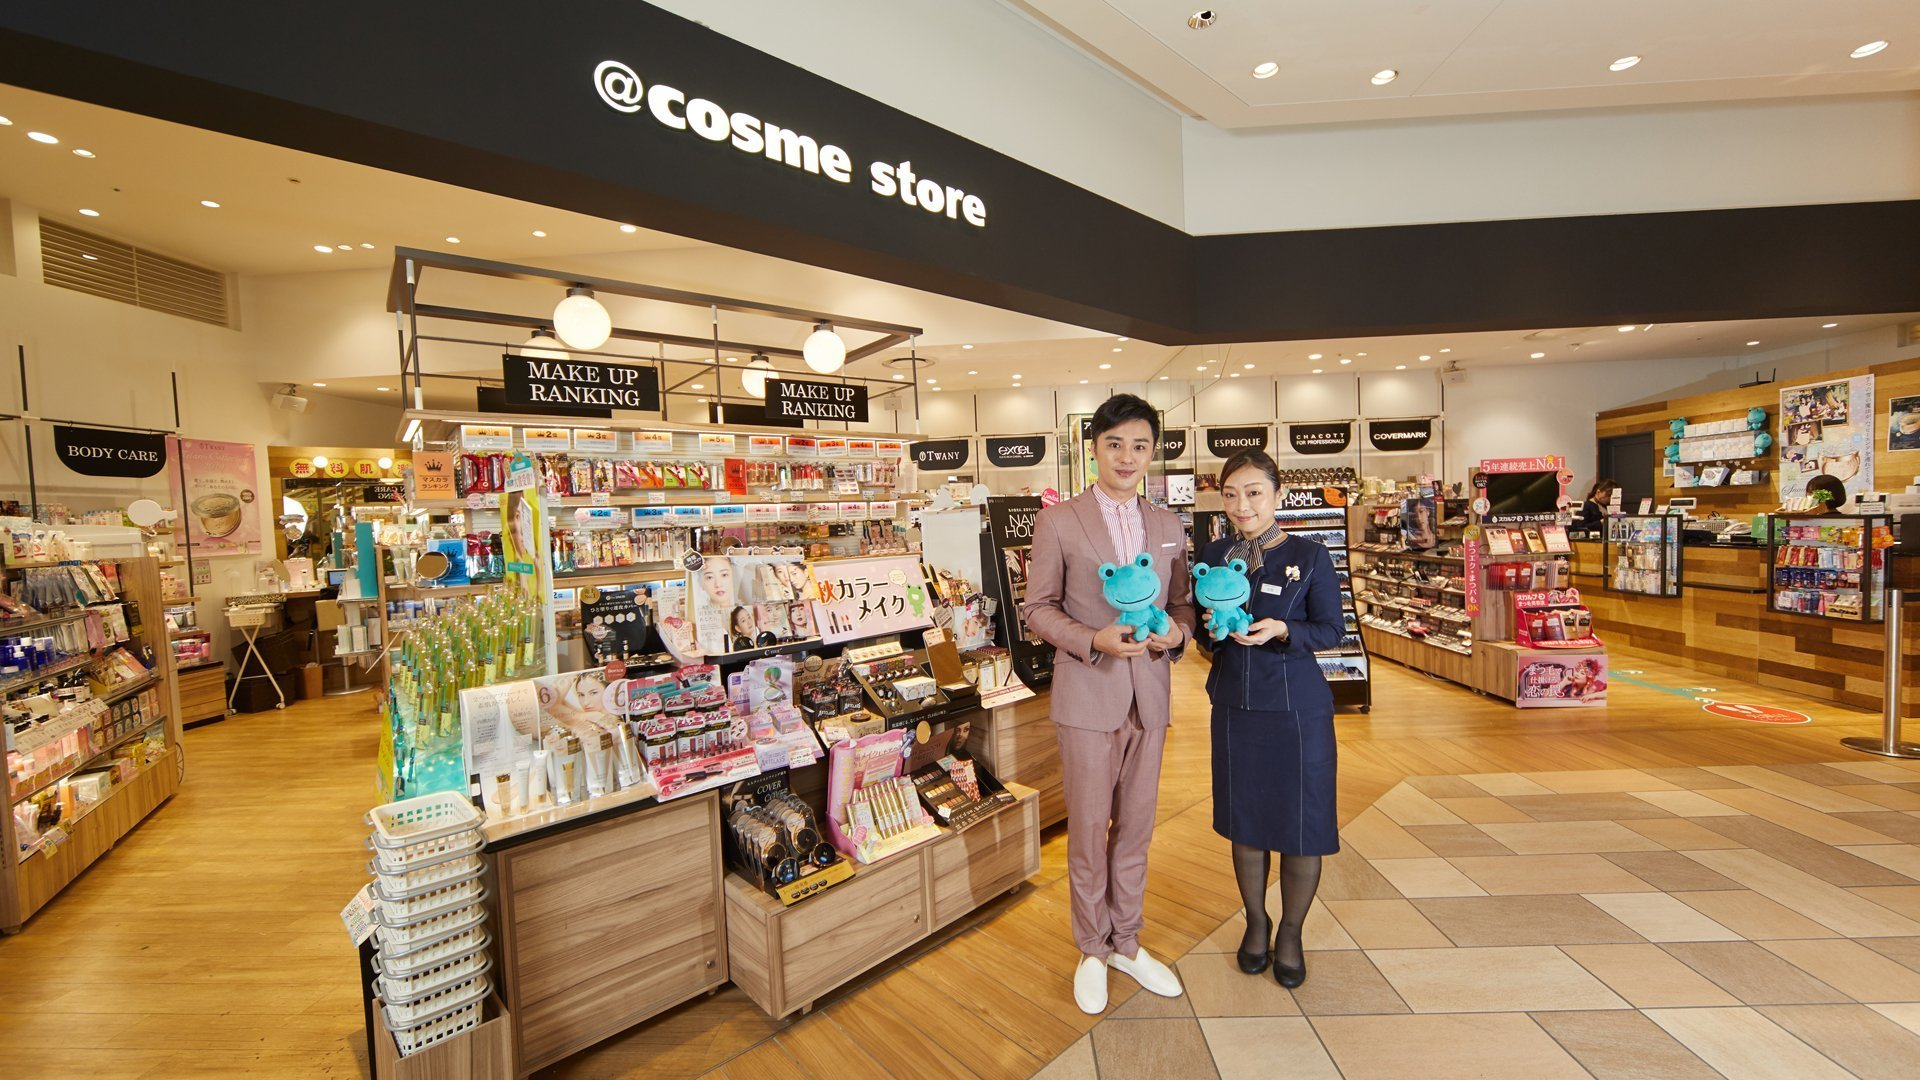 @cosme store、Sam 老師